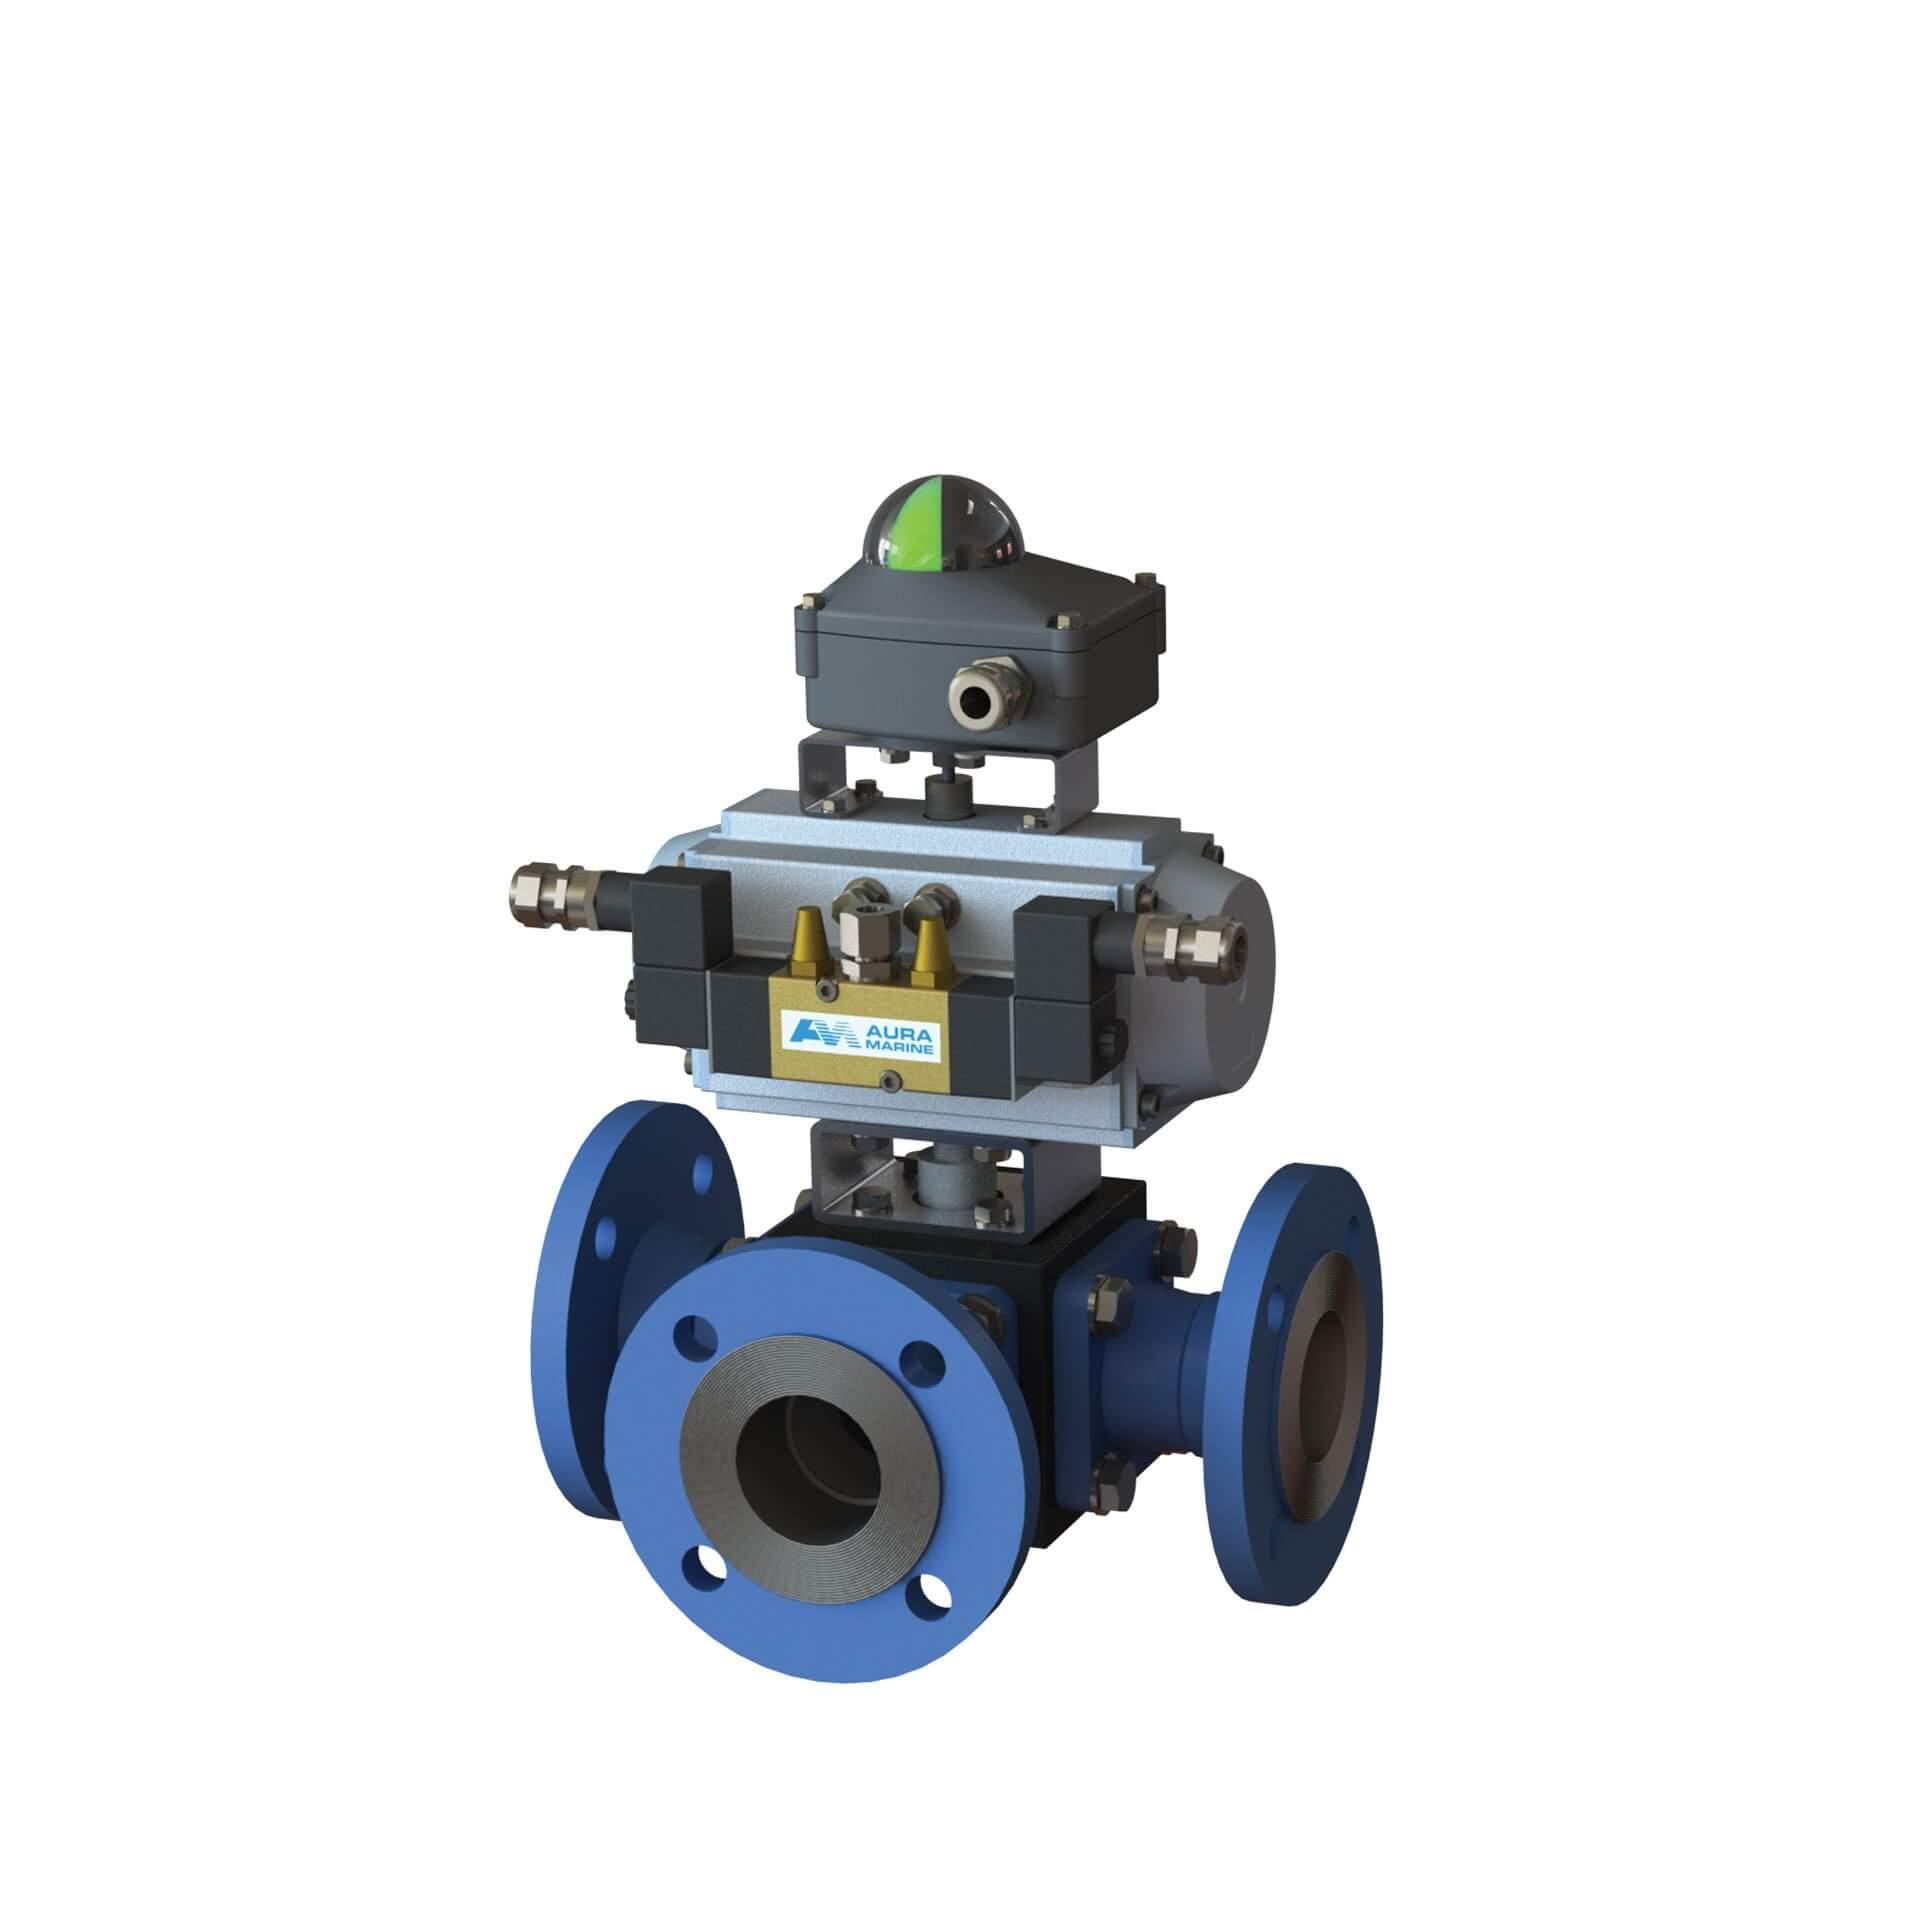 Valves - 3-way valve